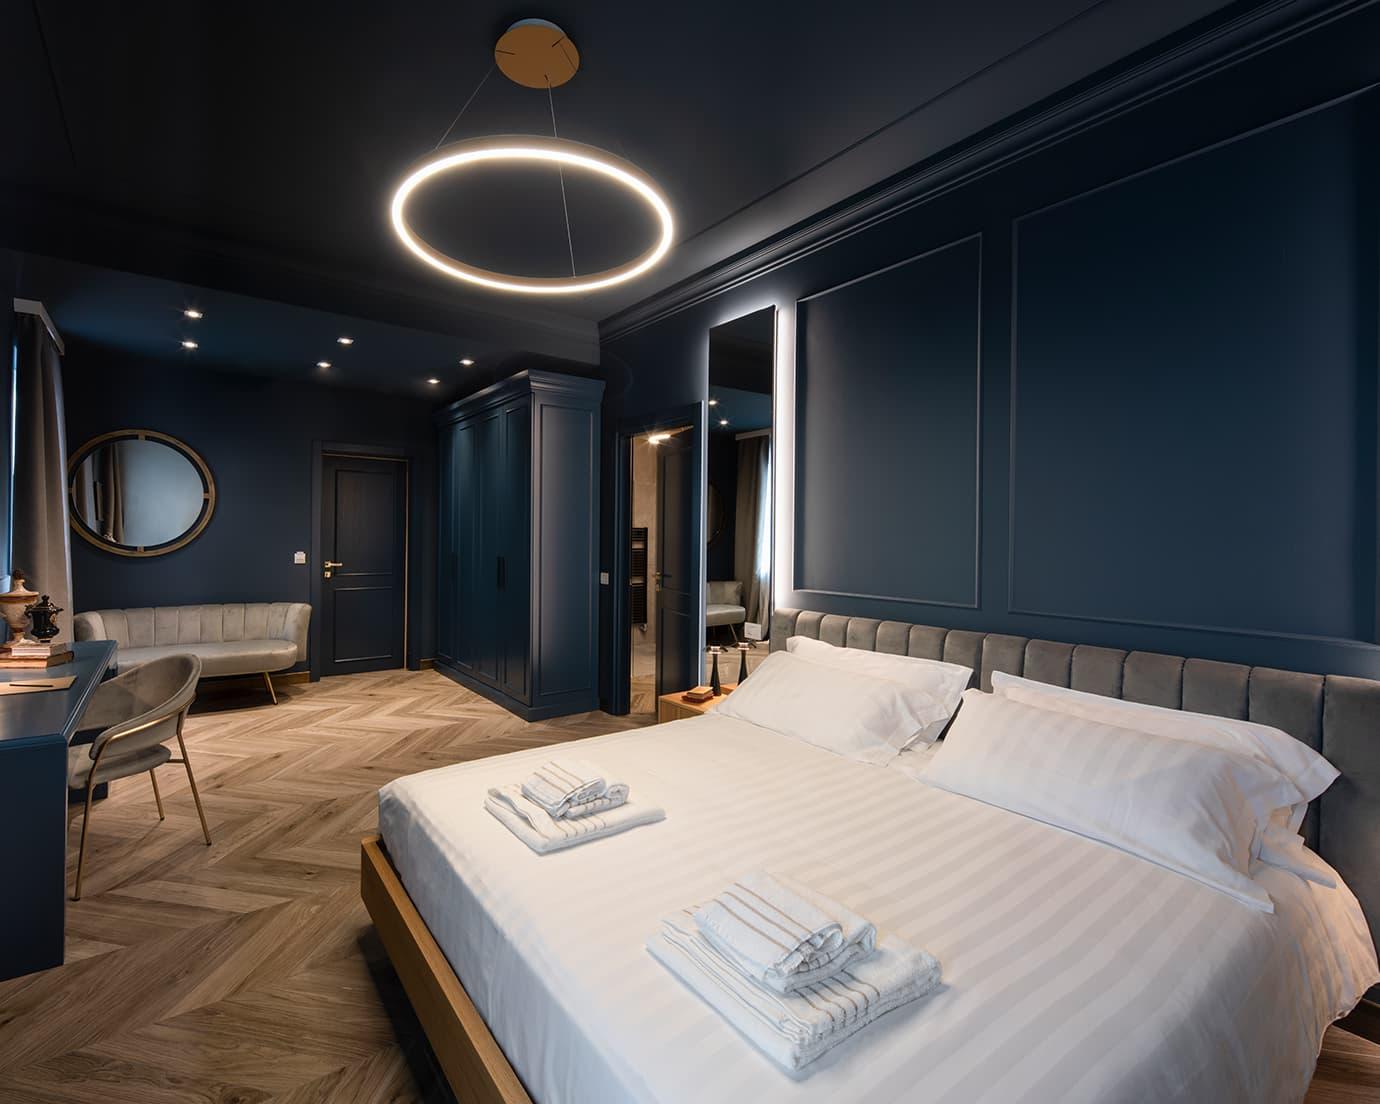 hotel-1-2.jpg